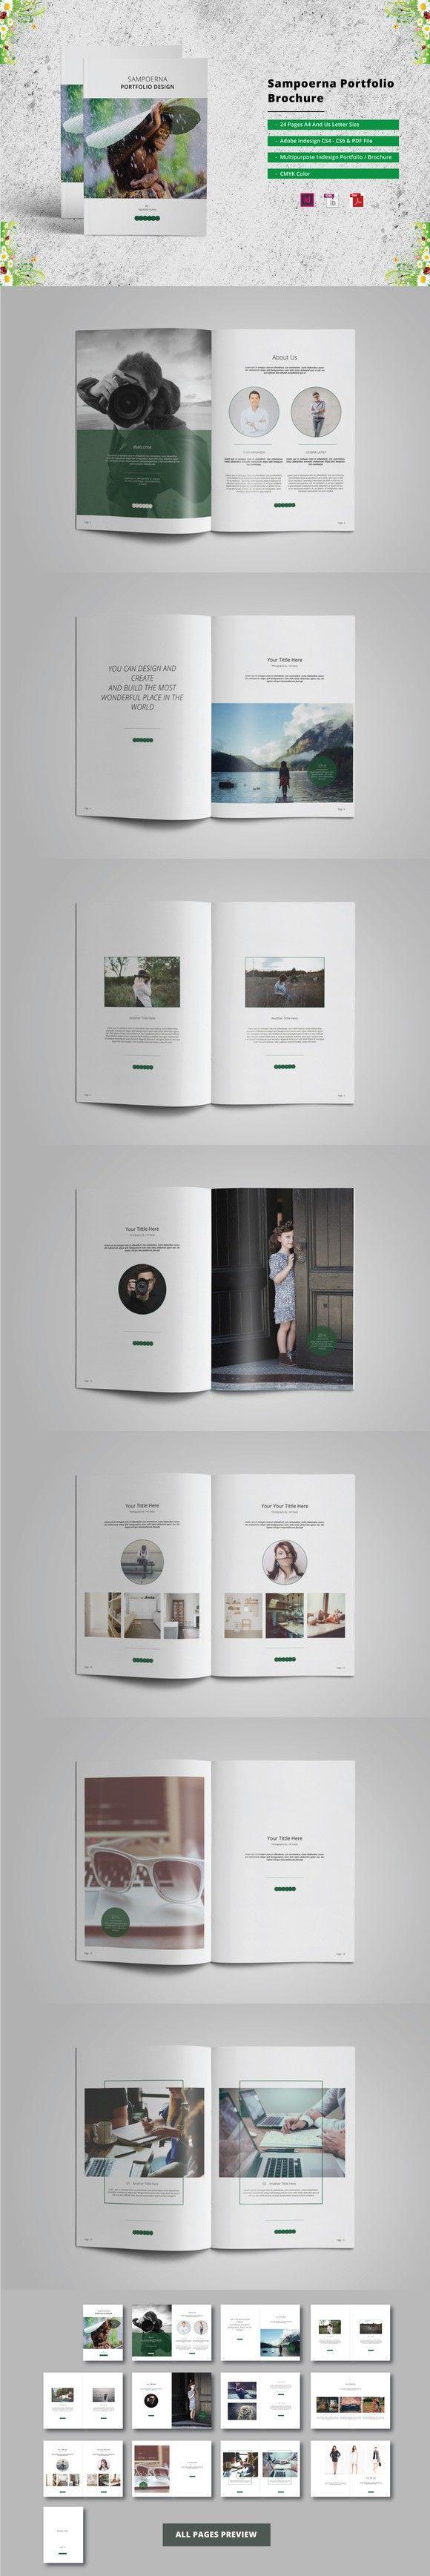 Sampoerna Portfolio / Brochure. Proposal Brochure Templates. $10.00